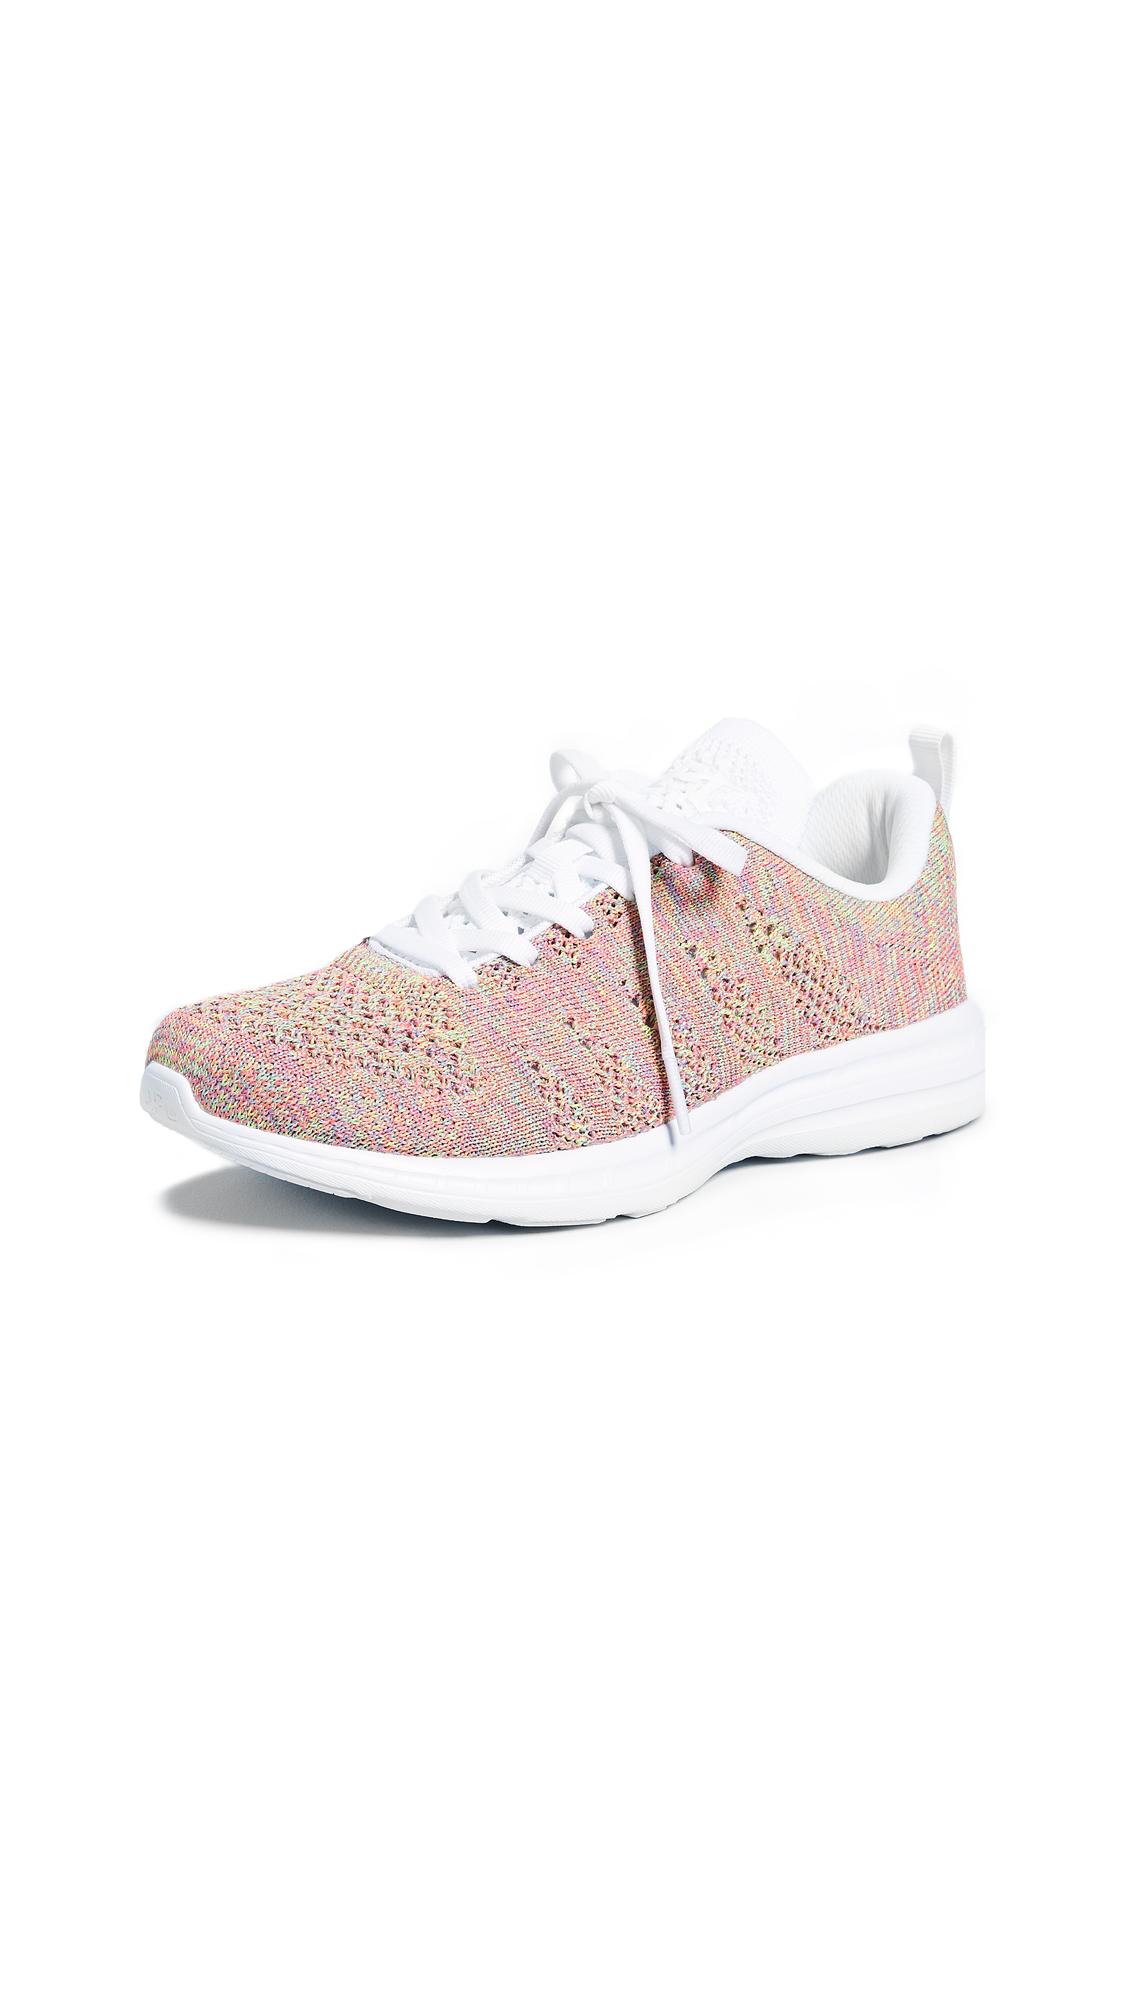 APL: Athletic Propulsion Labs Techloom Pro Sneakers - Multi Metallic/Melange